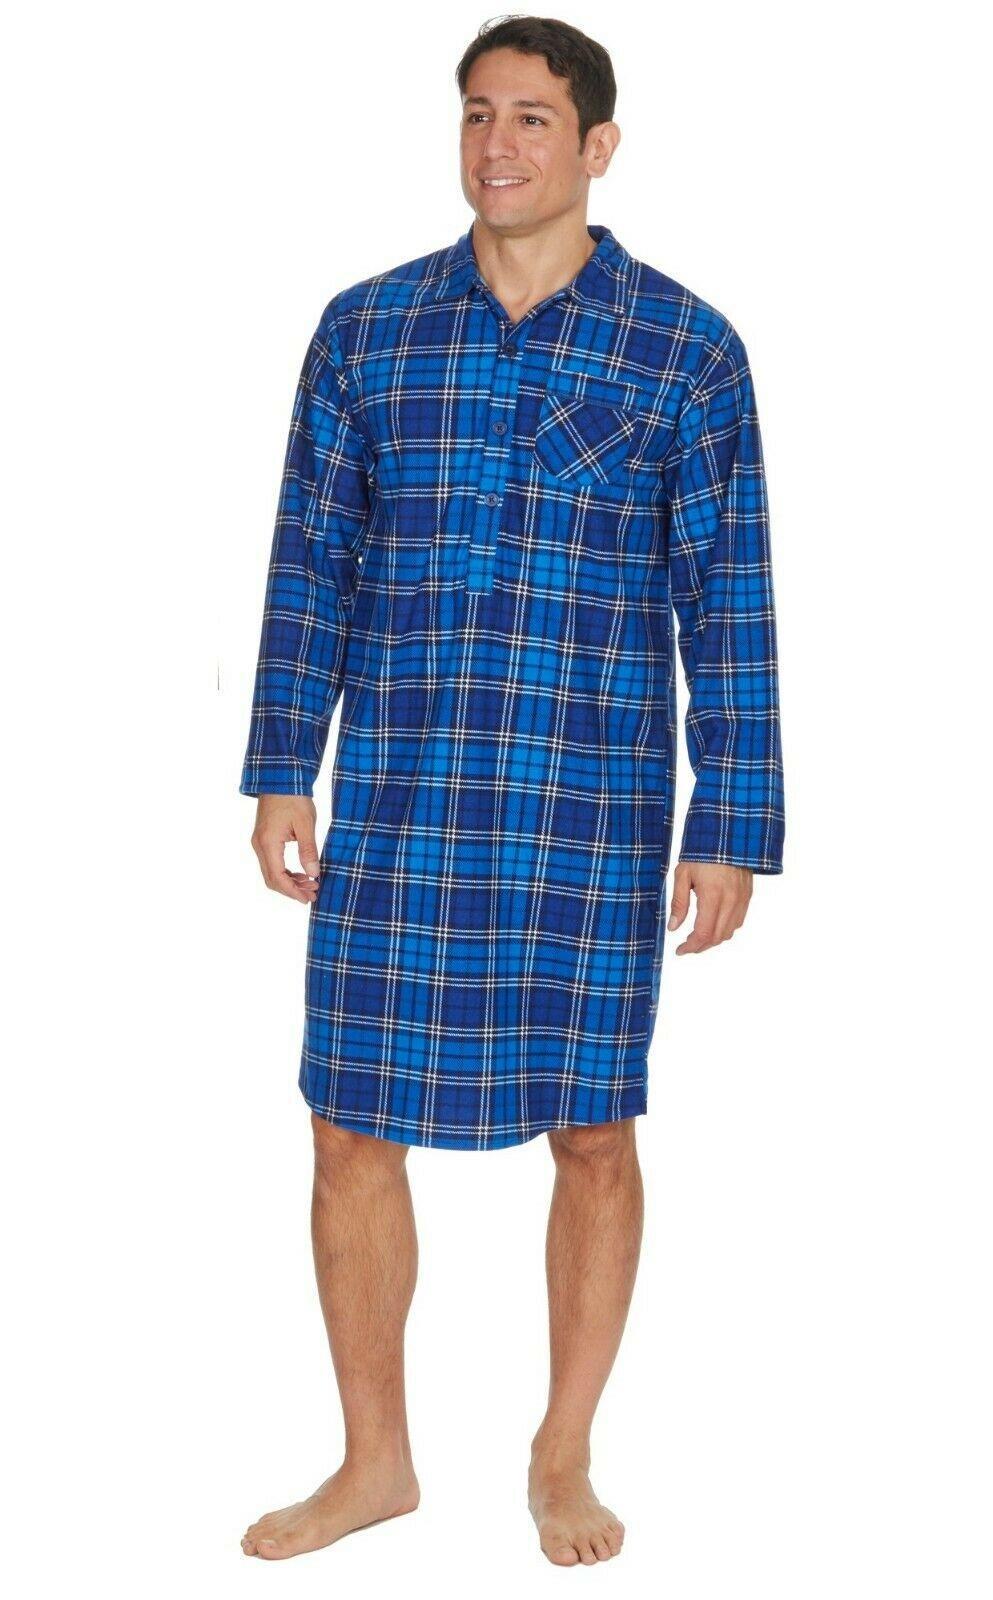 Mens Gents Warm Soft Thermal Flannel Blue Check Nightshirt Pyjama Nightie